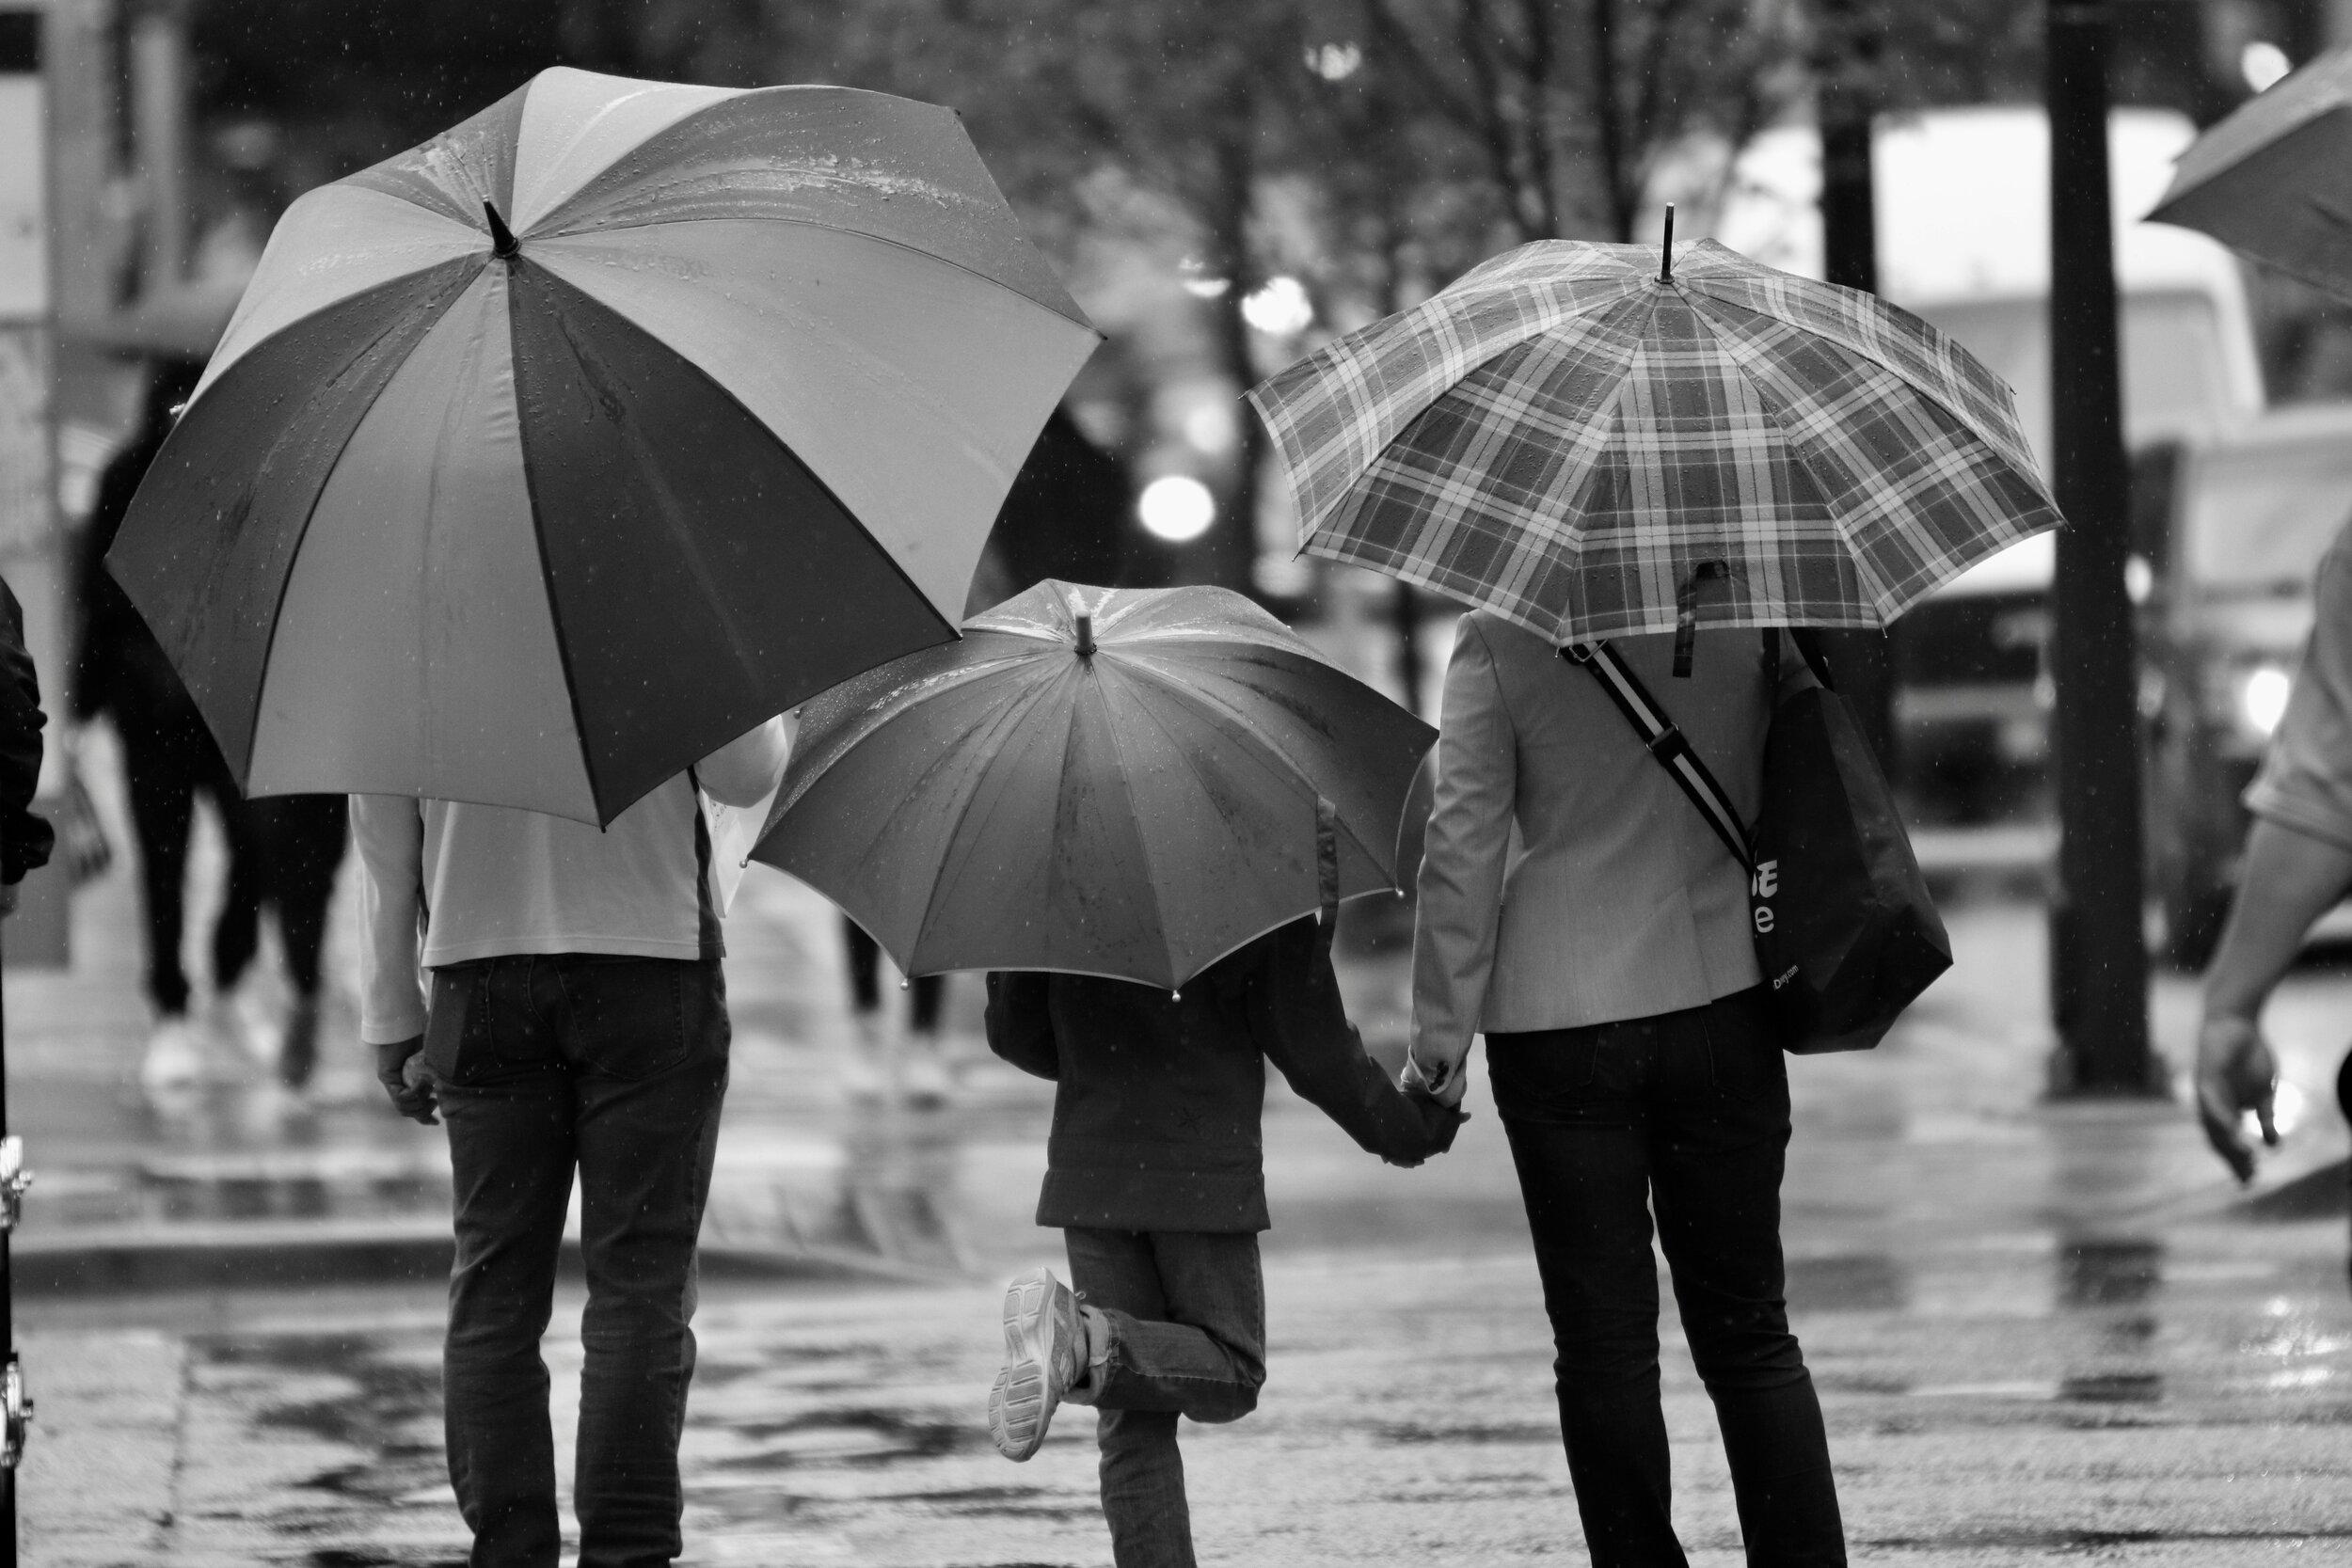 b:w umbrellas web page image.jpg